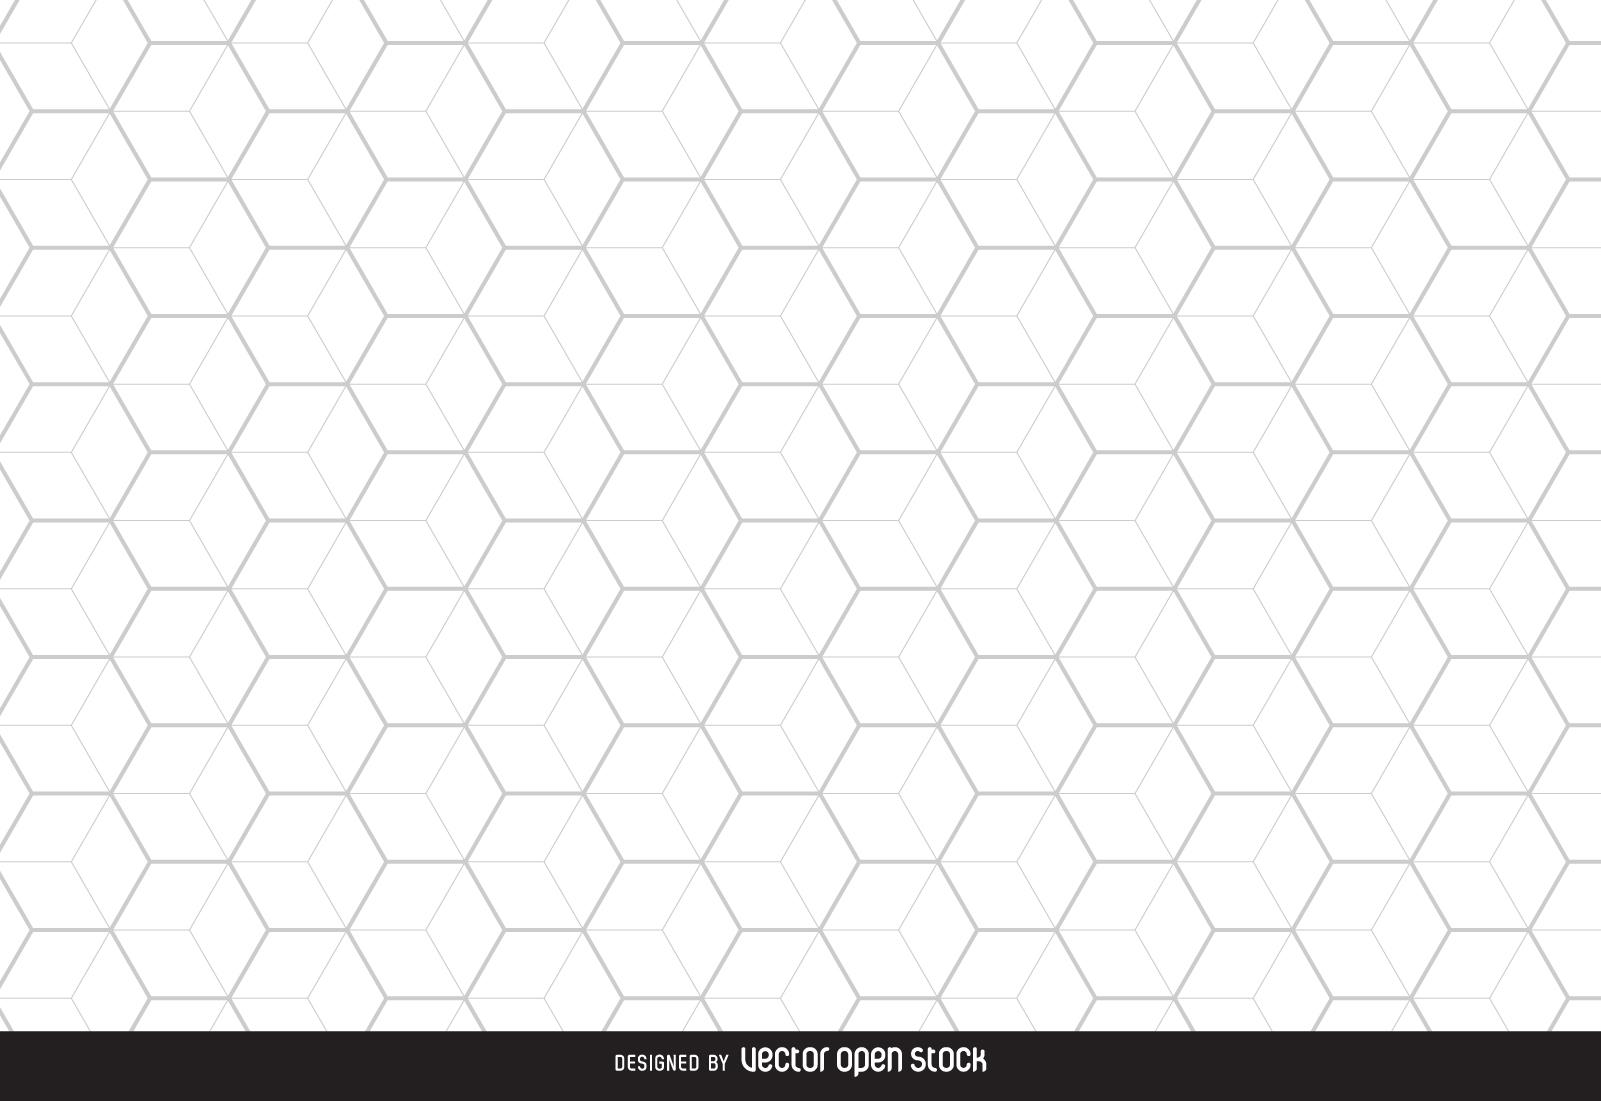 Honeycomb hexagonal background.